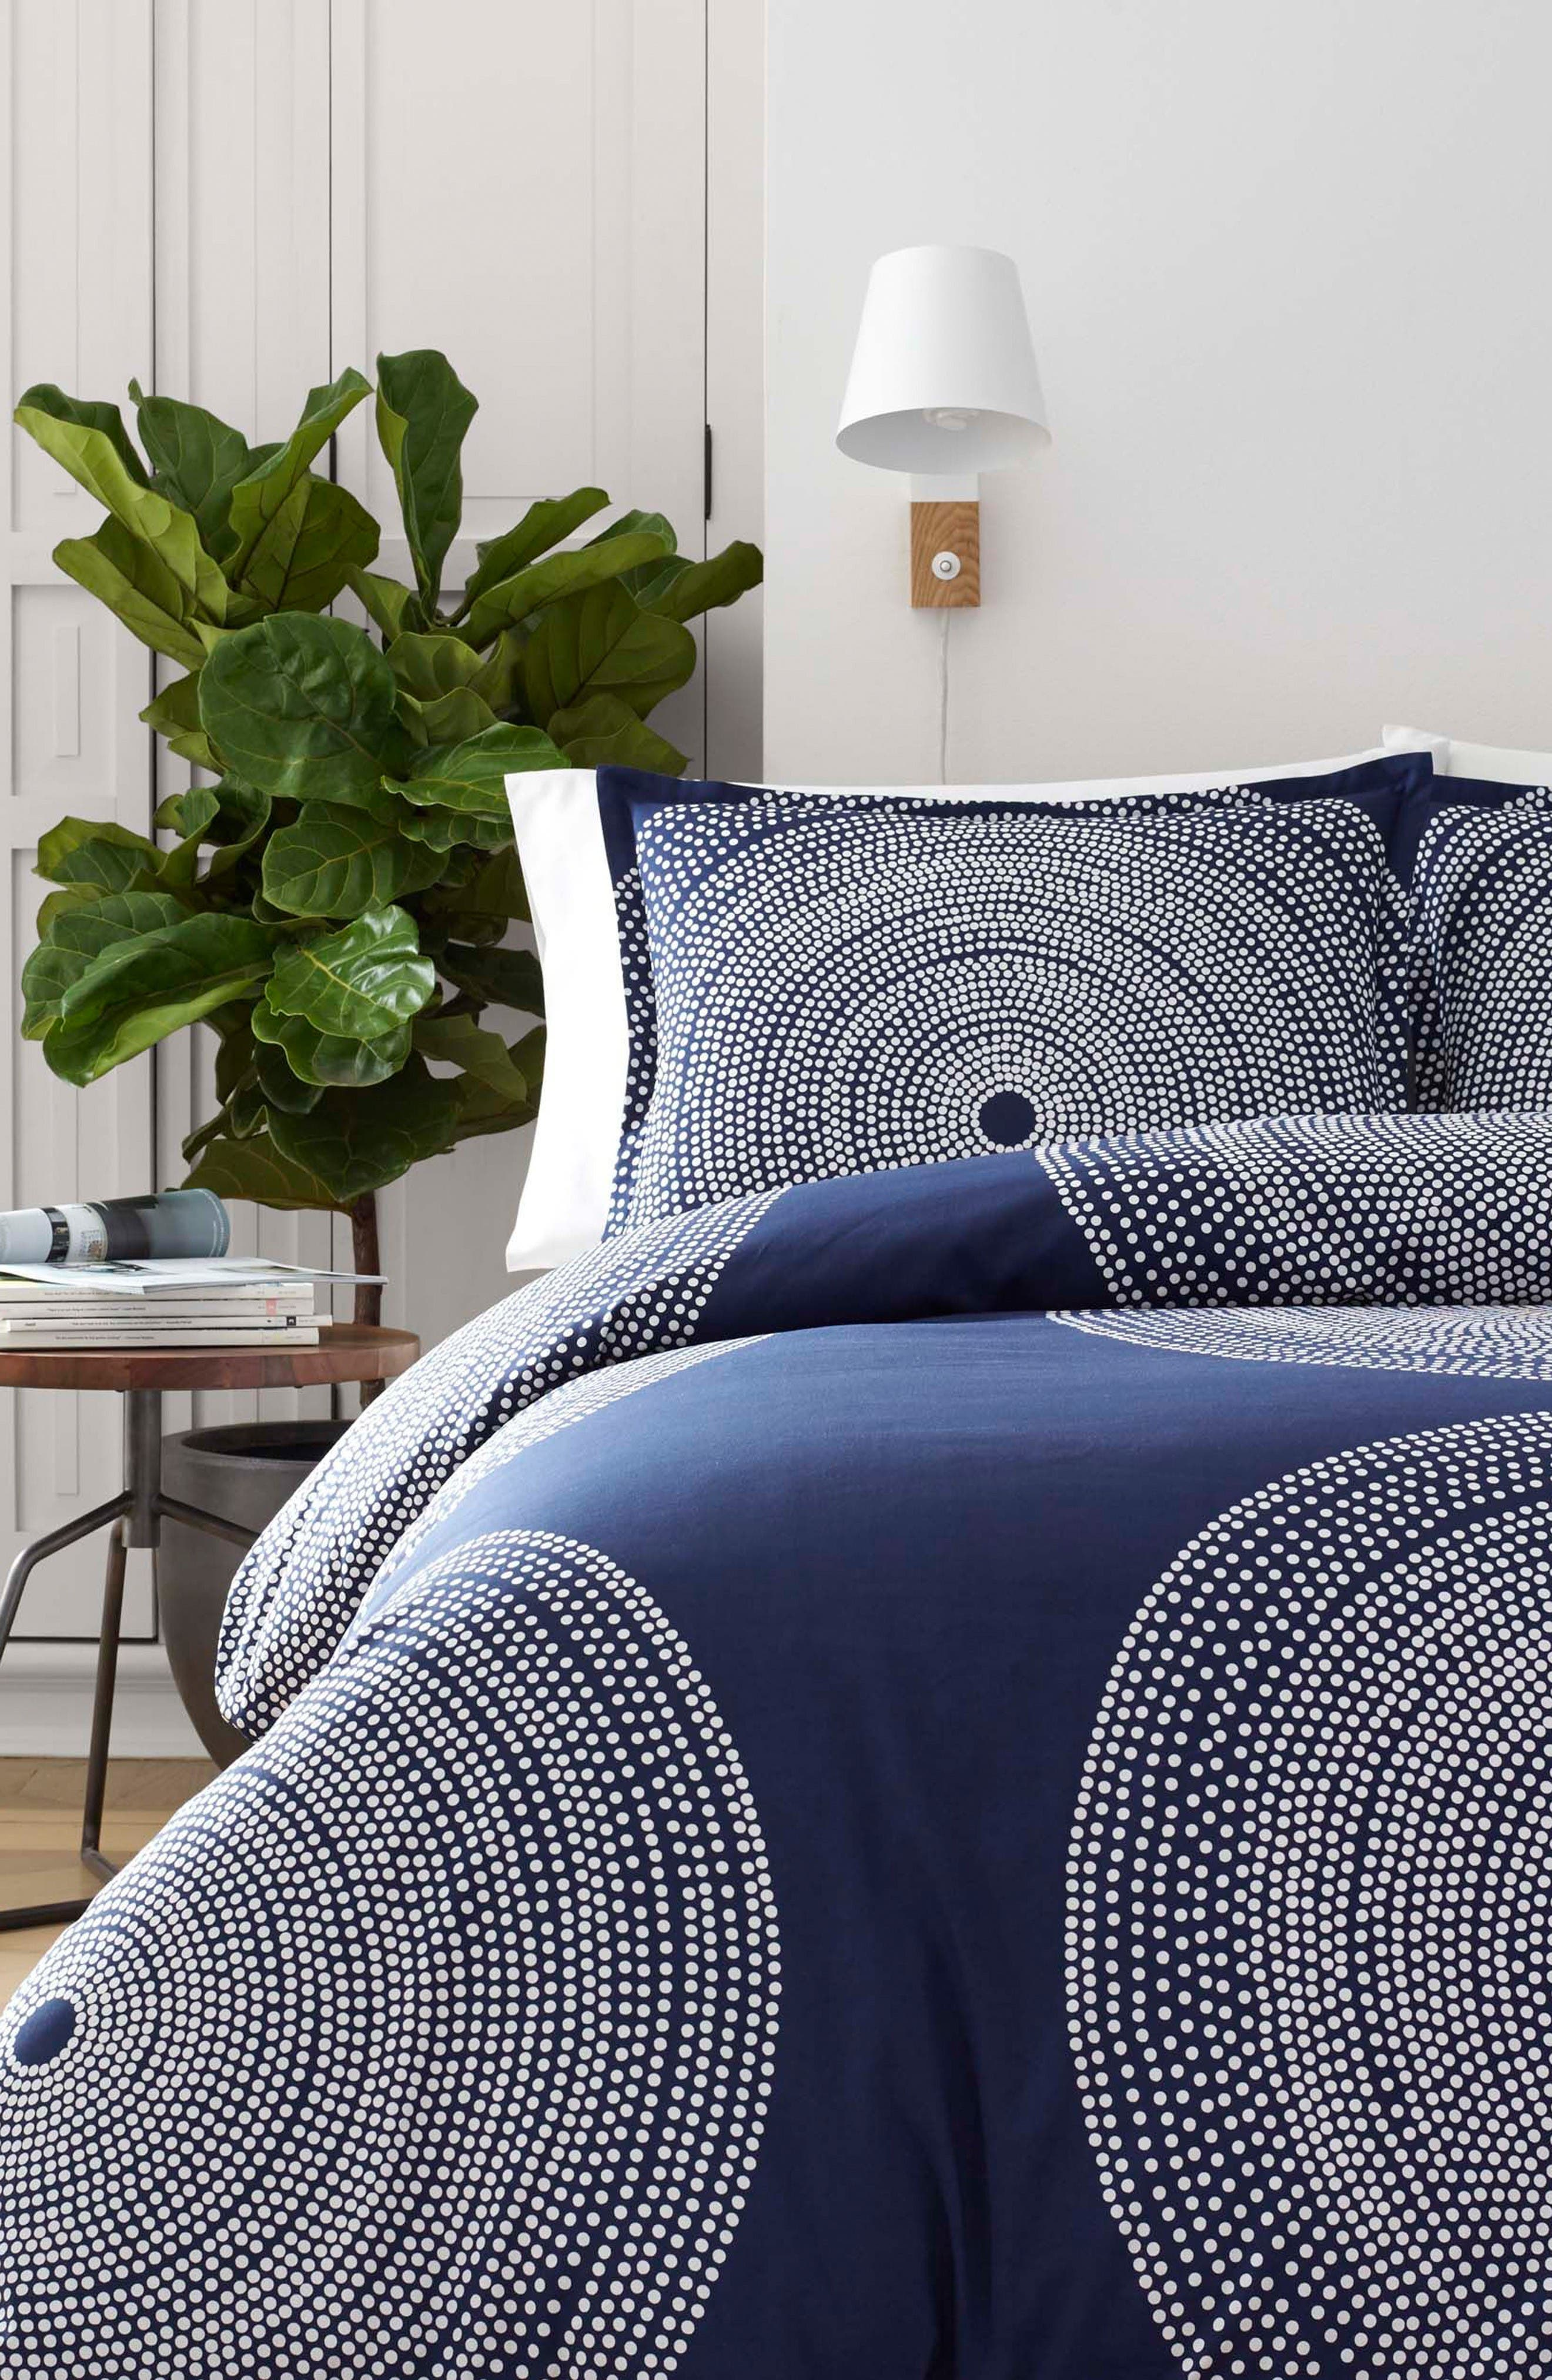 Main Image - Marimekko Fokus Comforter & Sham Set